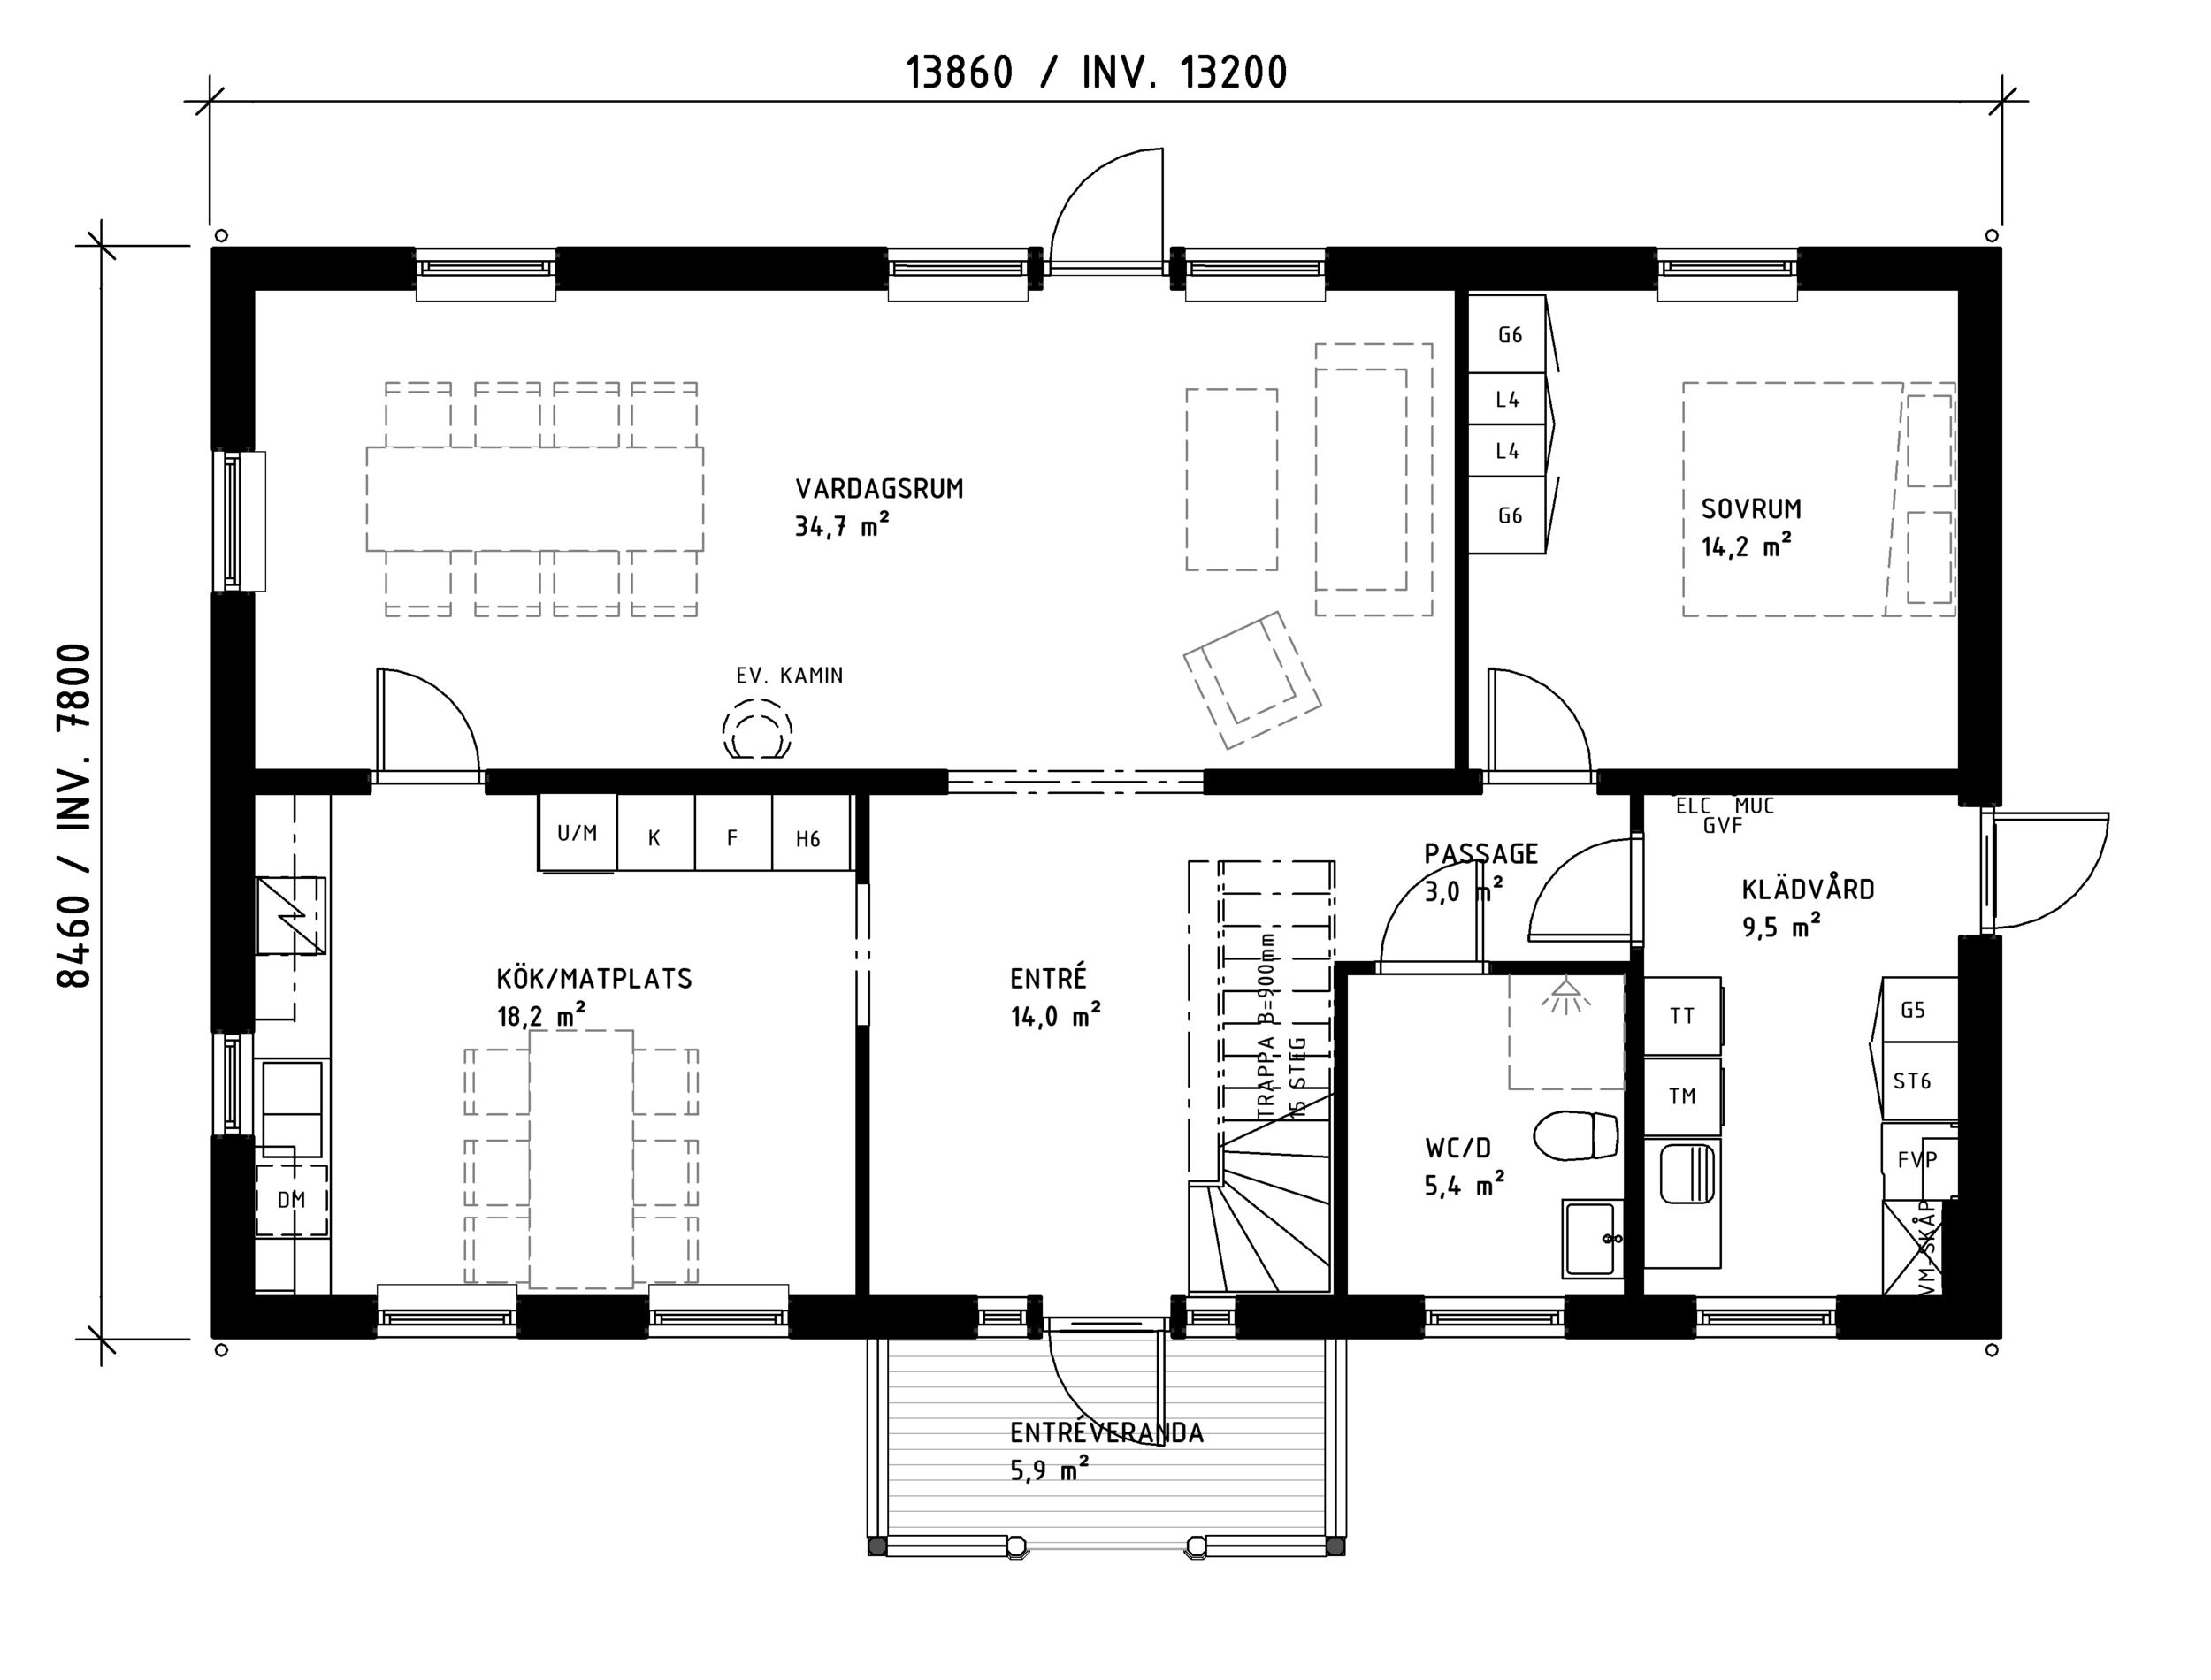 5.1.308 Högalid plan 190815-entre.png